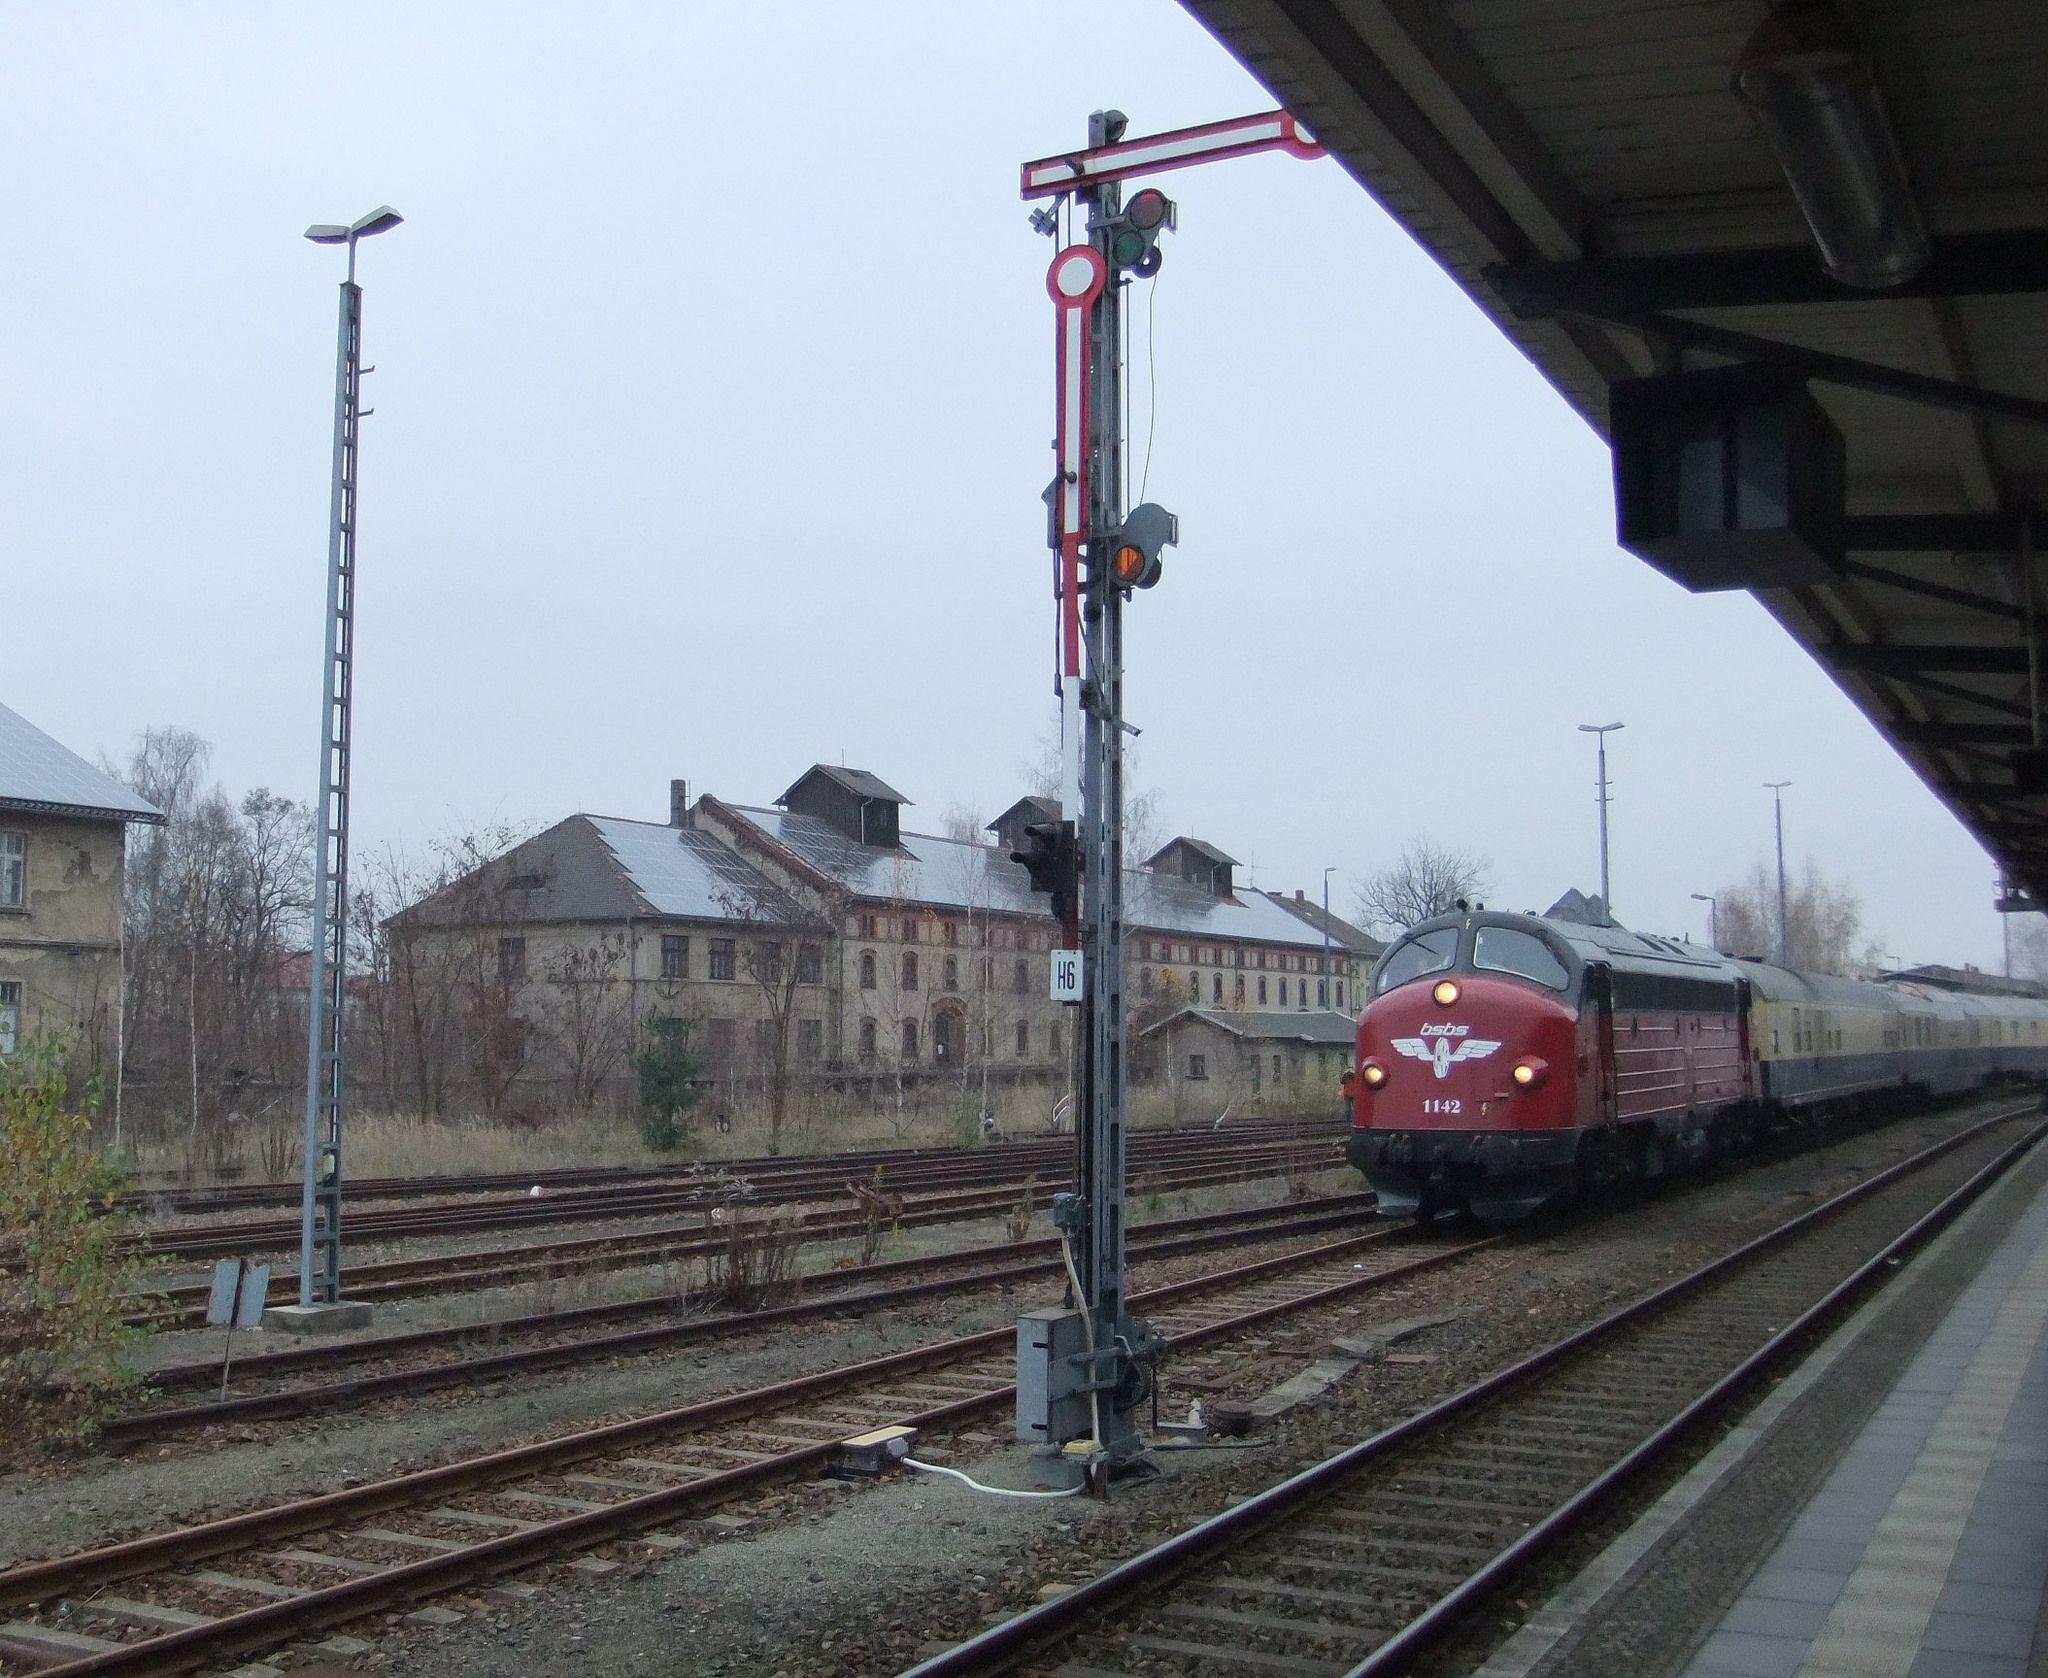 https://flic.kr/p/wz2QMA | Bahnhof Zittau | Rheingold